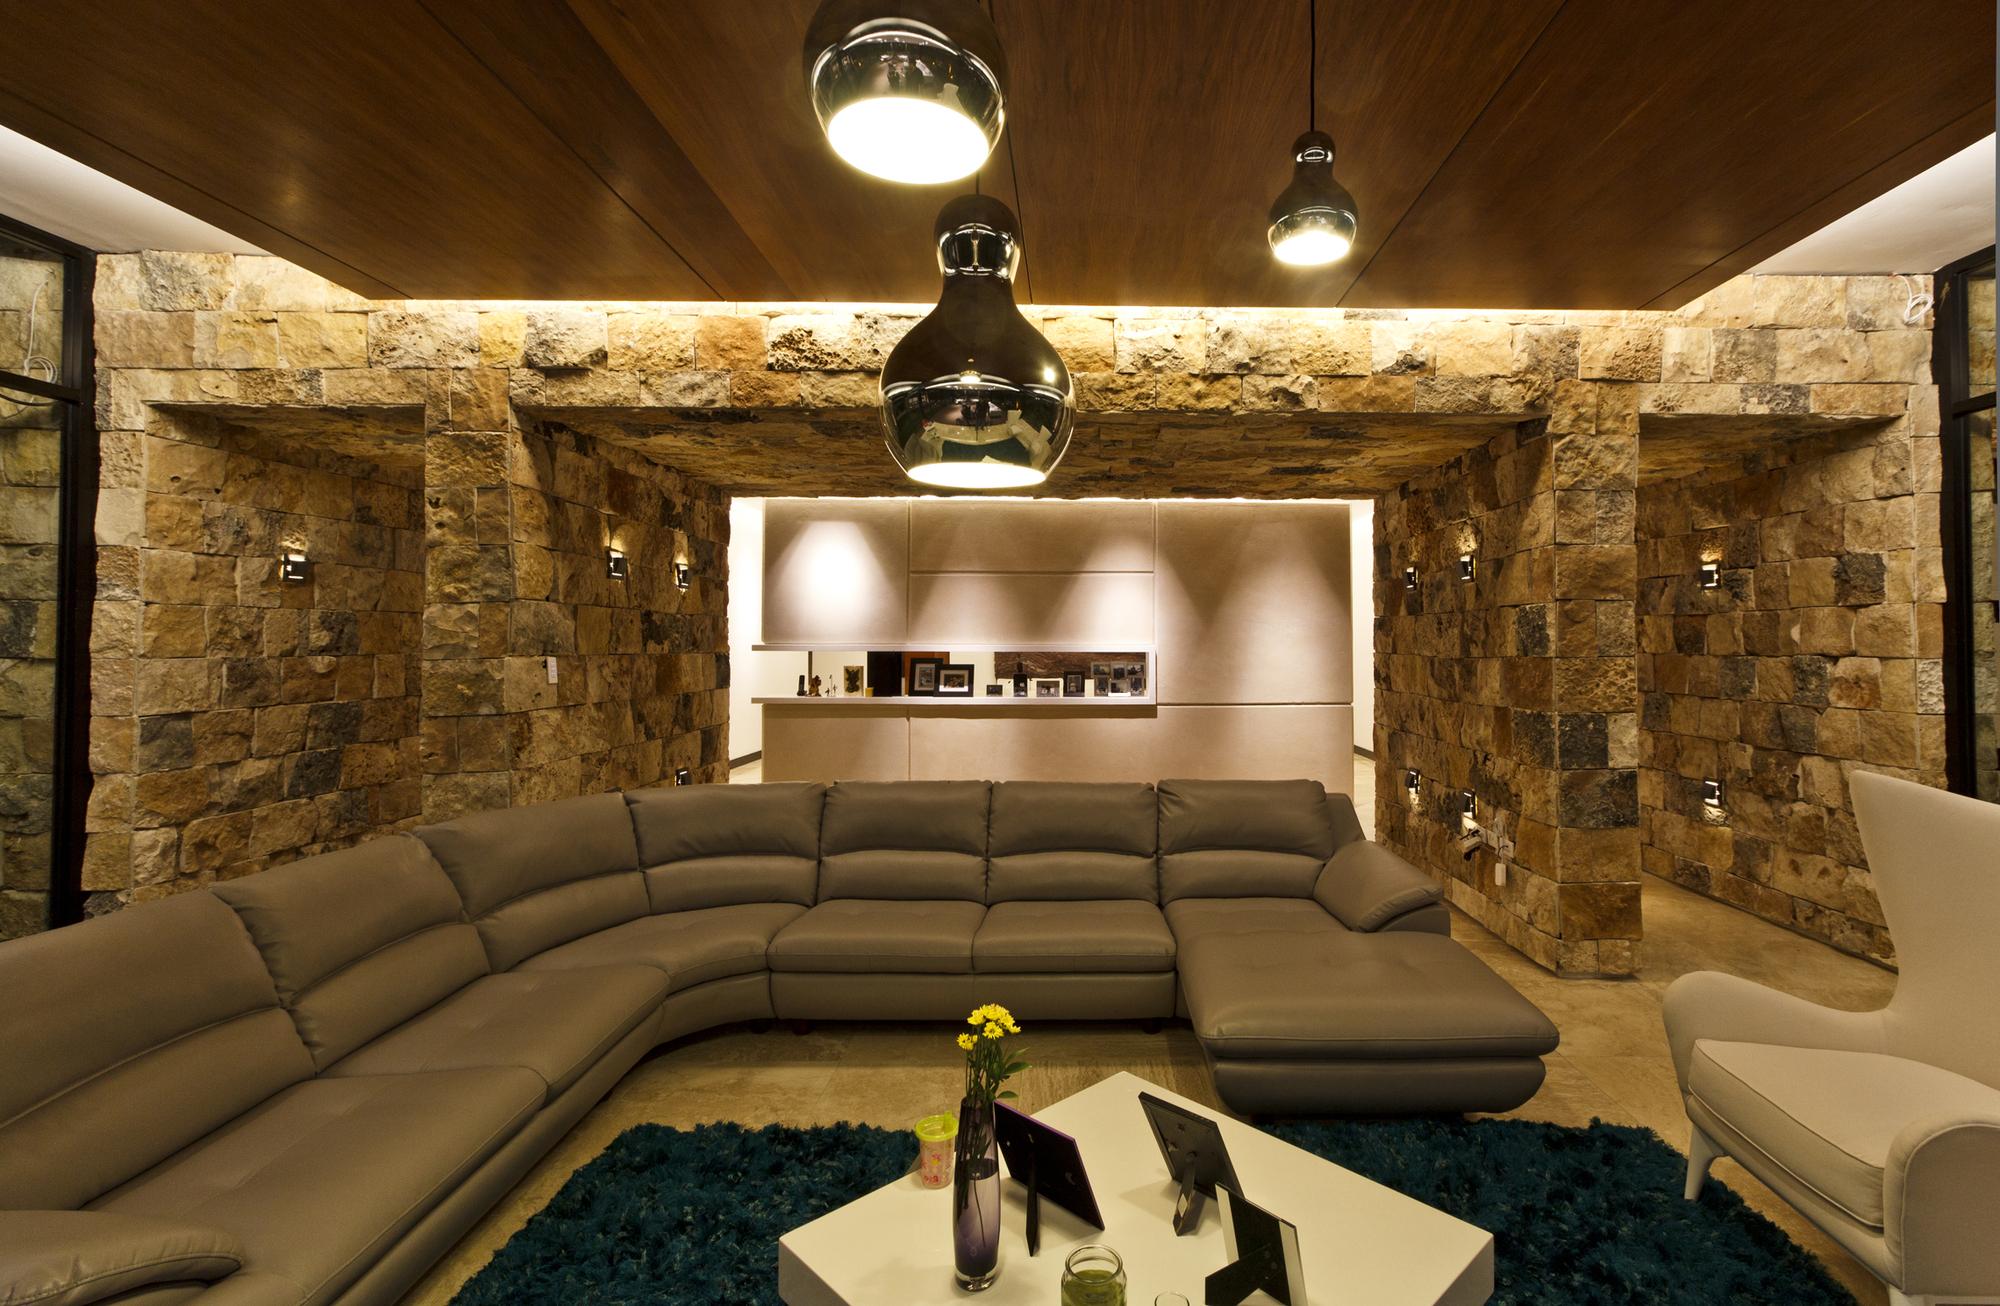 Contemporary-Comfort-At-The-Temozón-House-in-Yucatan-Mexico-6